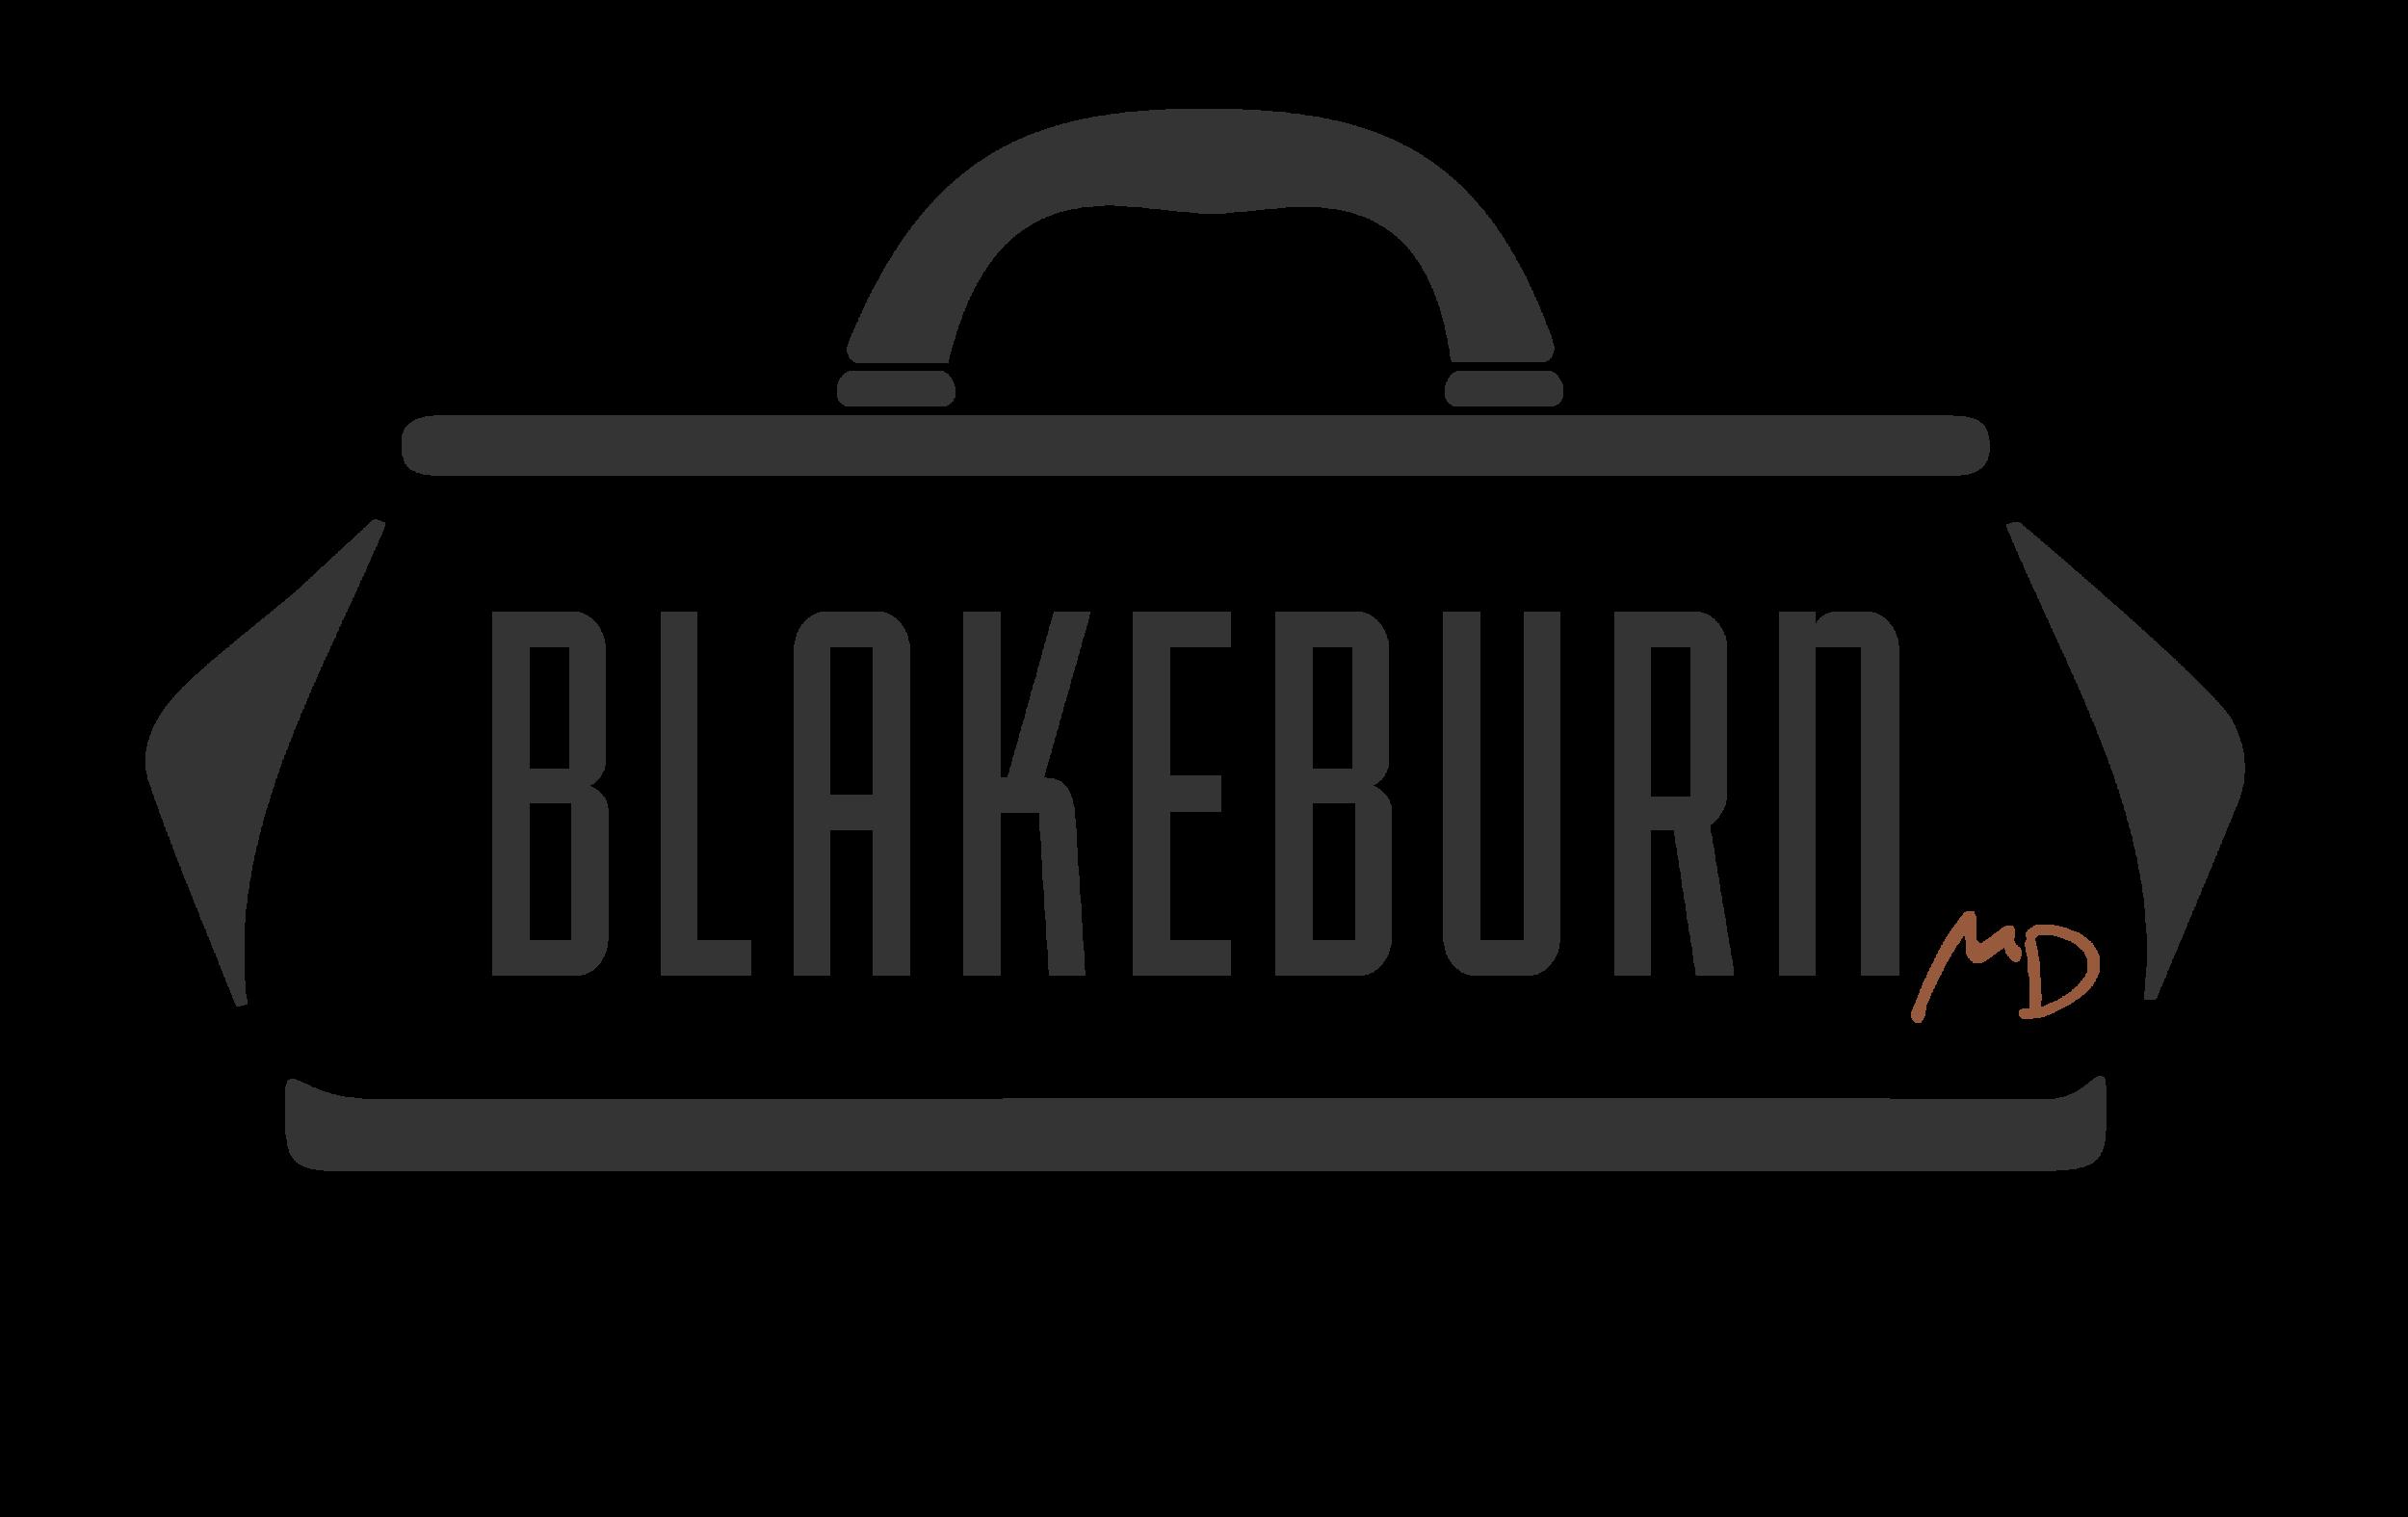 BLAKEBURN-MD-LOGO.png